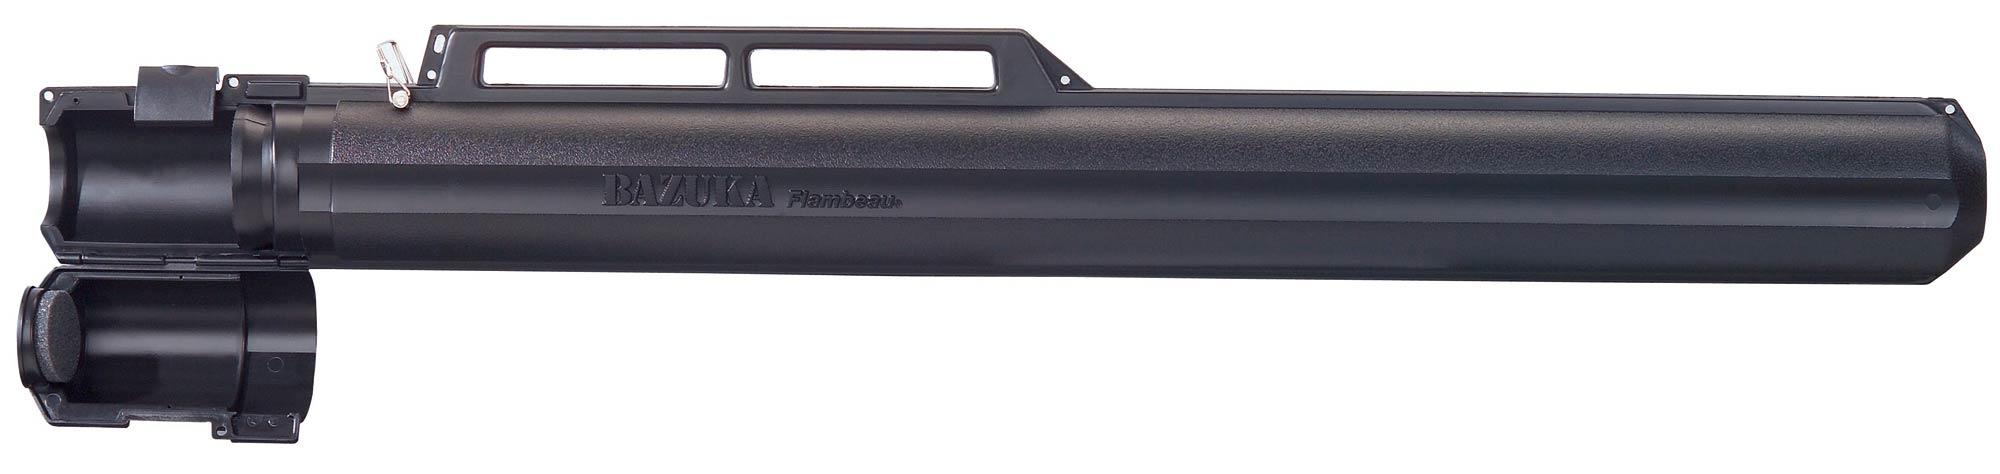 Balzer Zerust Bazuka Pro Rutentransportrohr, Länge 185-255 cm